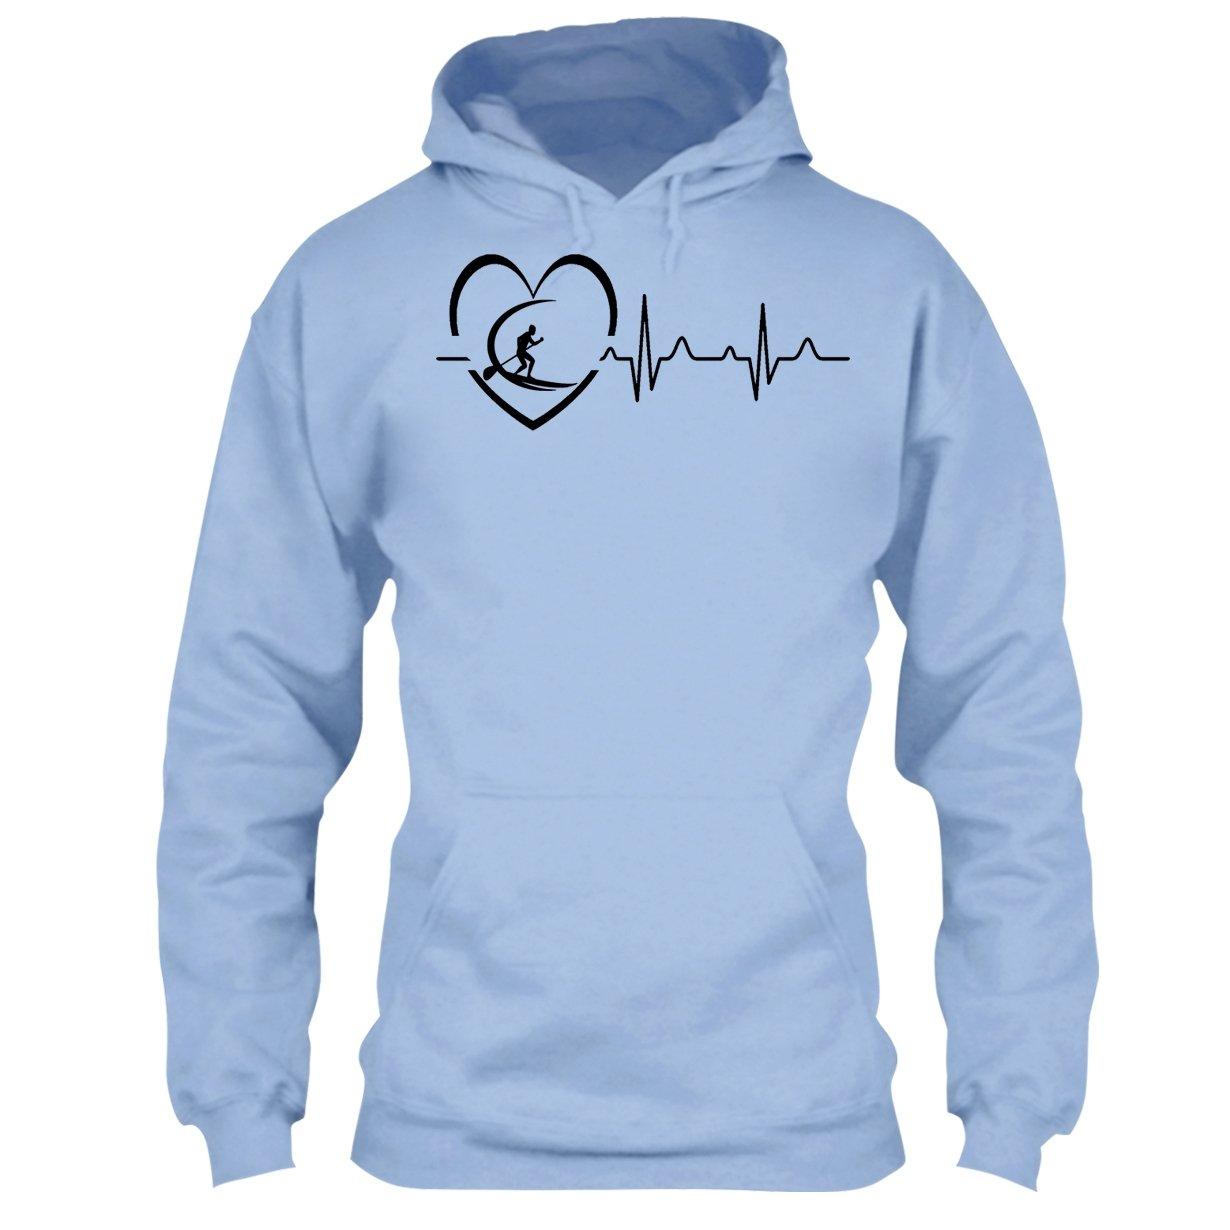 Arered Paddleboard Cool Tshirt Paddleboard Heartbeat T Shirt Design